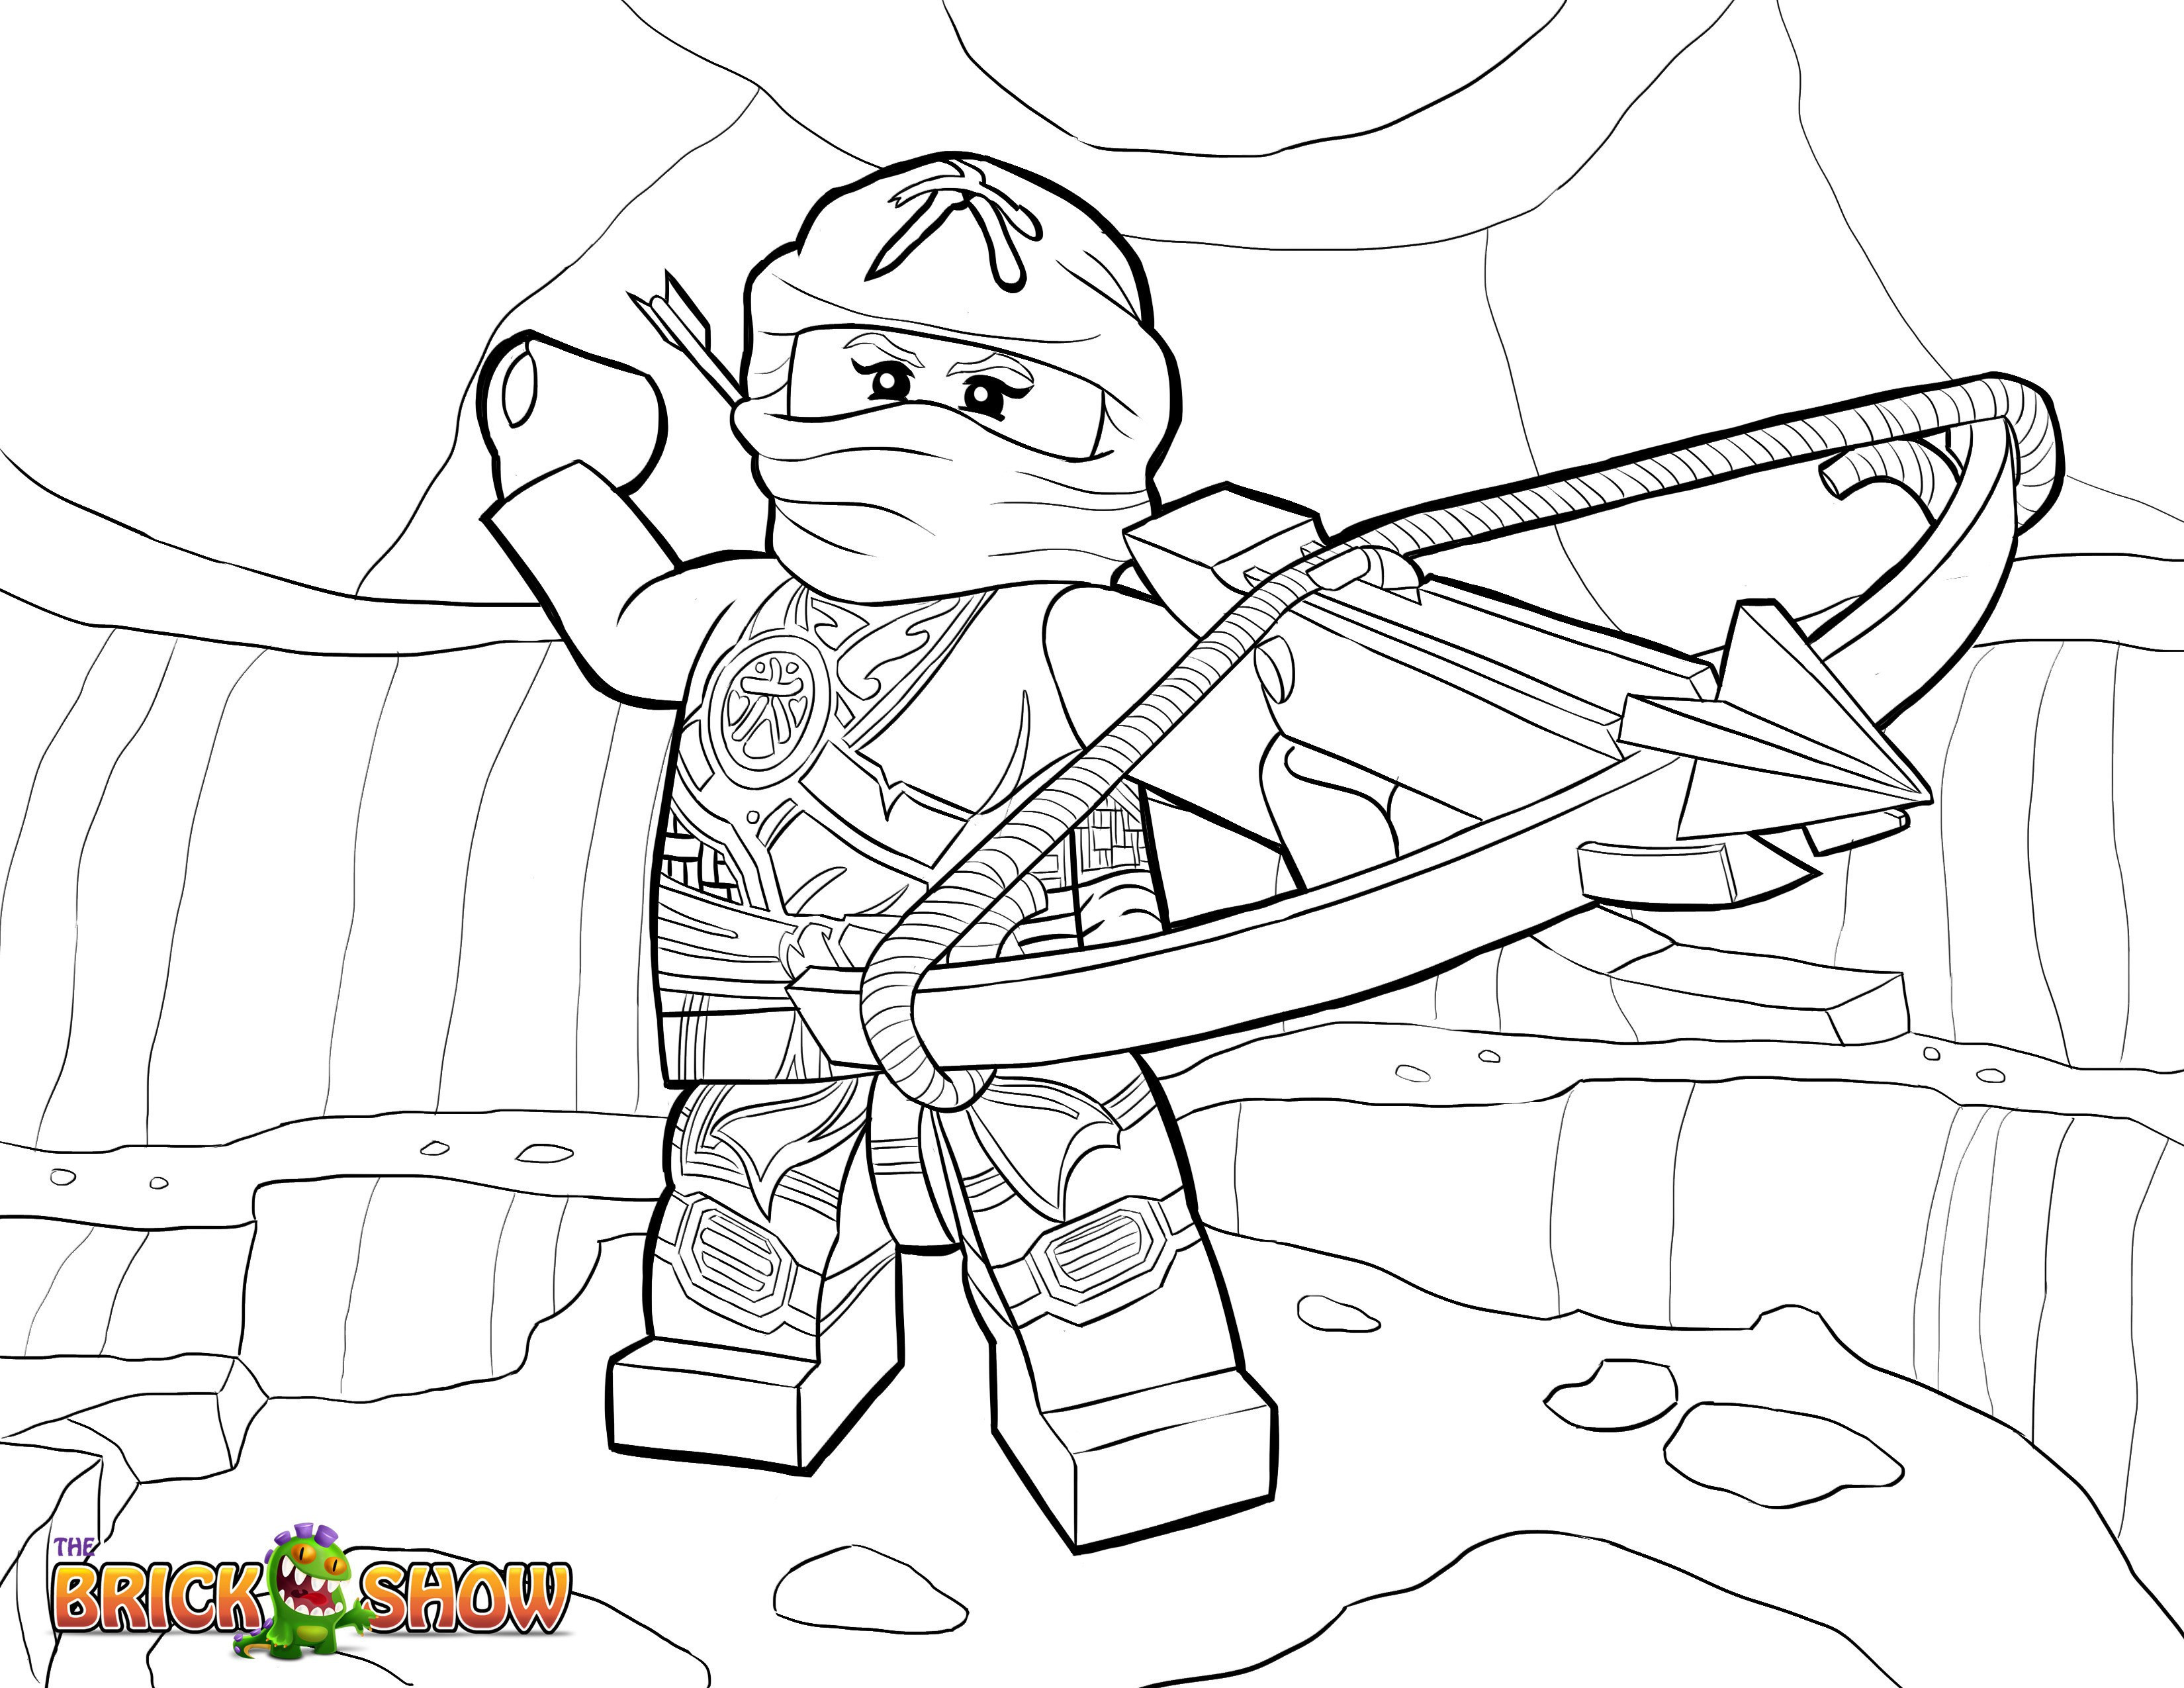 Ninjago Kai Ausmalbilder Das Beste Von 37 Ausmalbilder Ninjago Nya Scoredatscore Inspirierend Lego Ninjago Sammlung